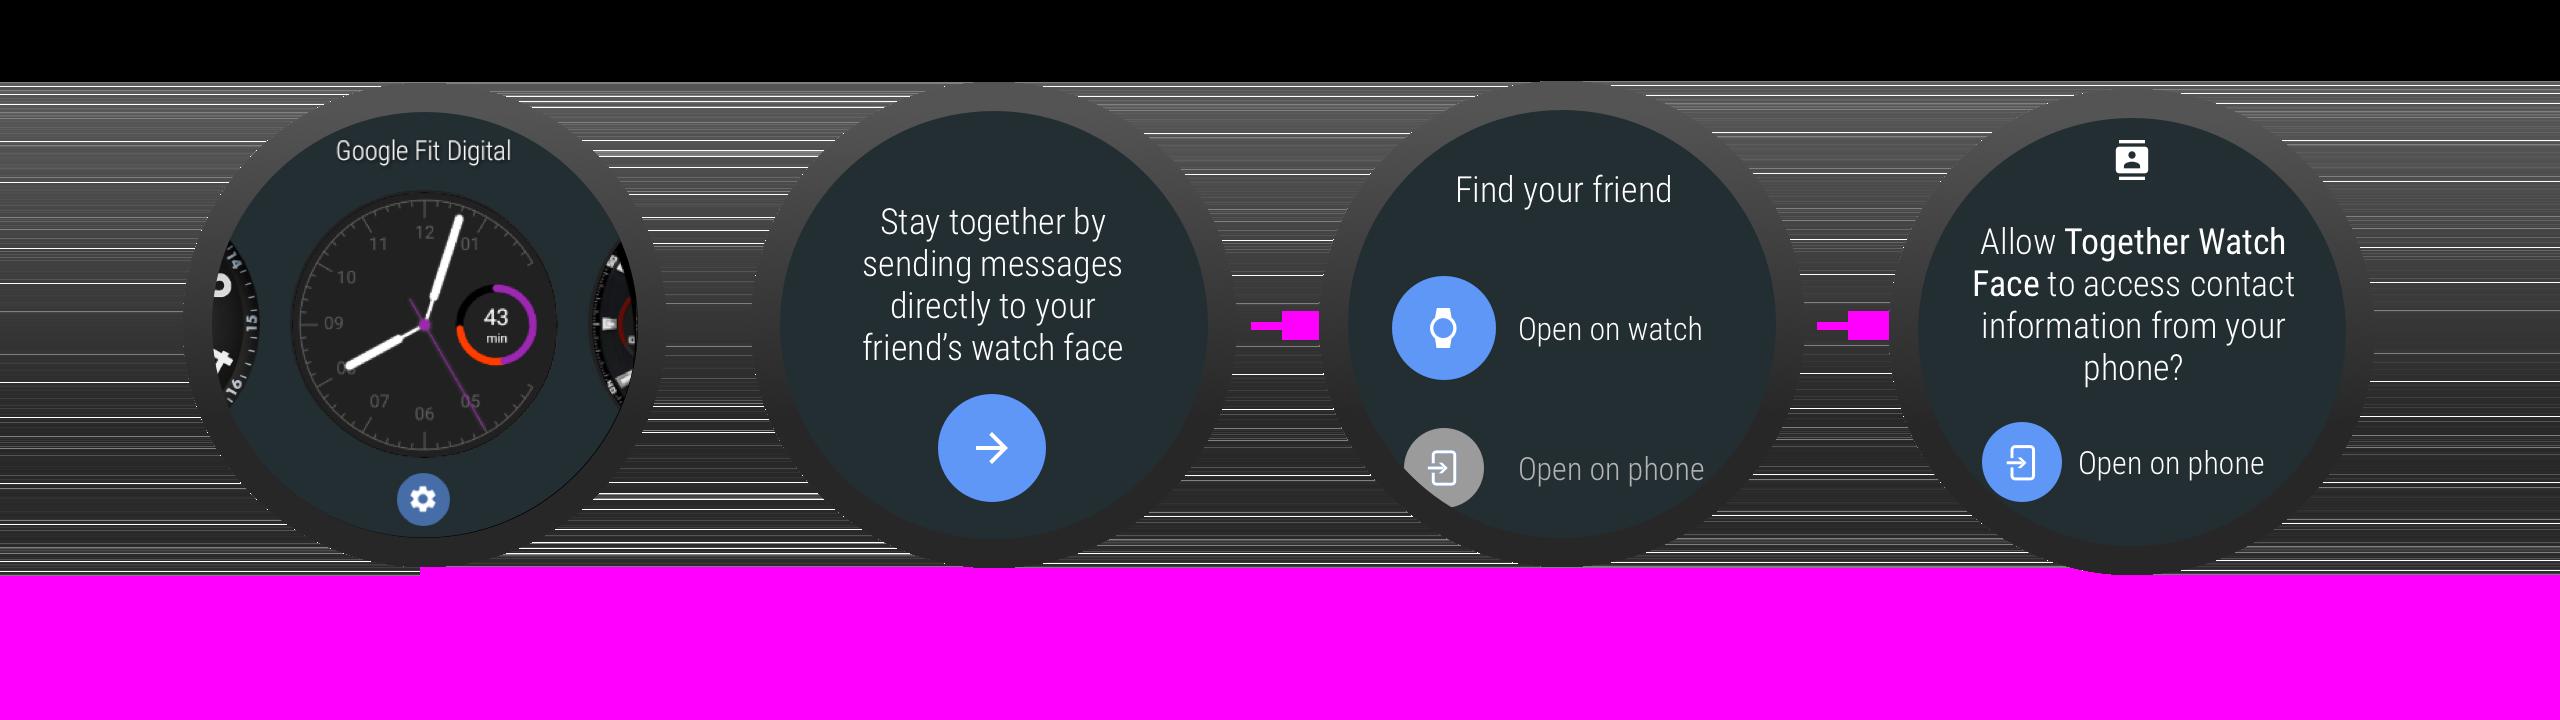 Ketika meminta izin saat peluncuran, aplikasi dapat menjelaskan alasan diperlukannya izin tersebut.